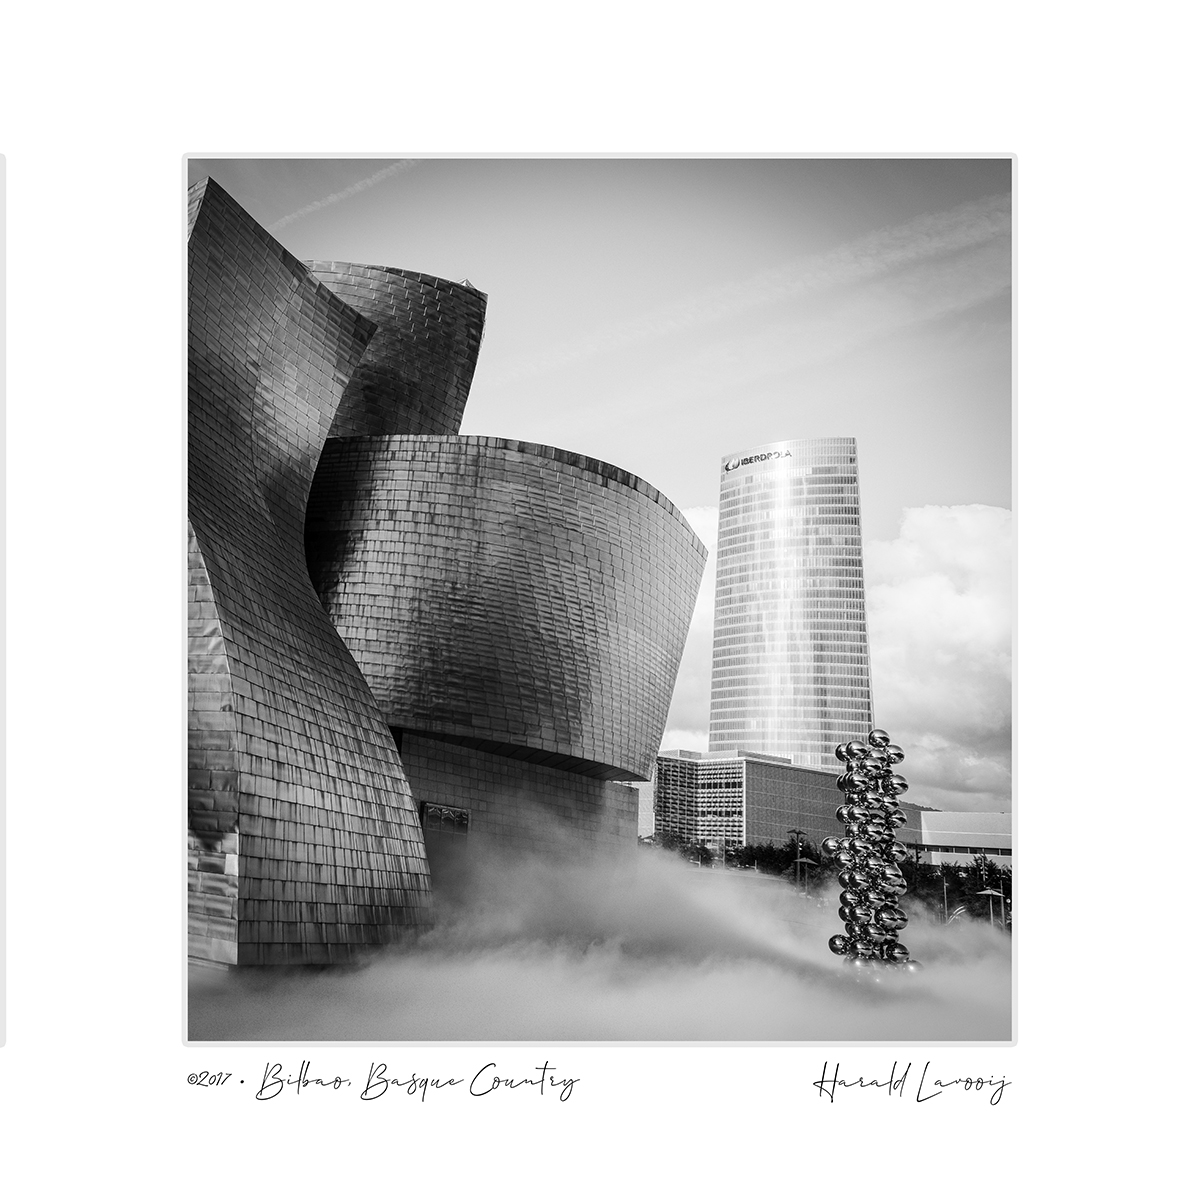 2017_Bilbao_BasqueCountry